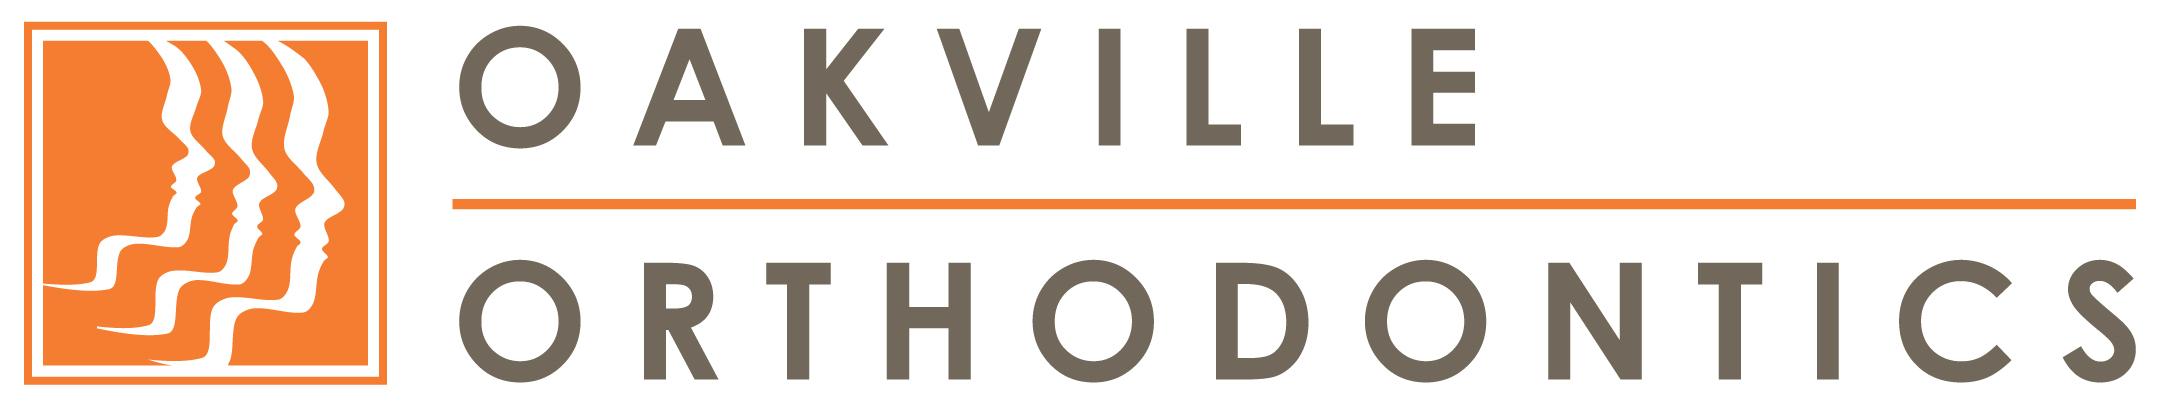 Oakville Orthodontics - Dentists - 905-845-8411